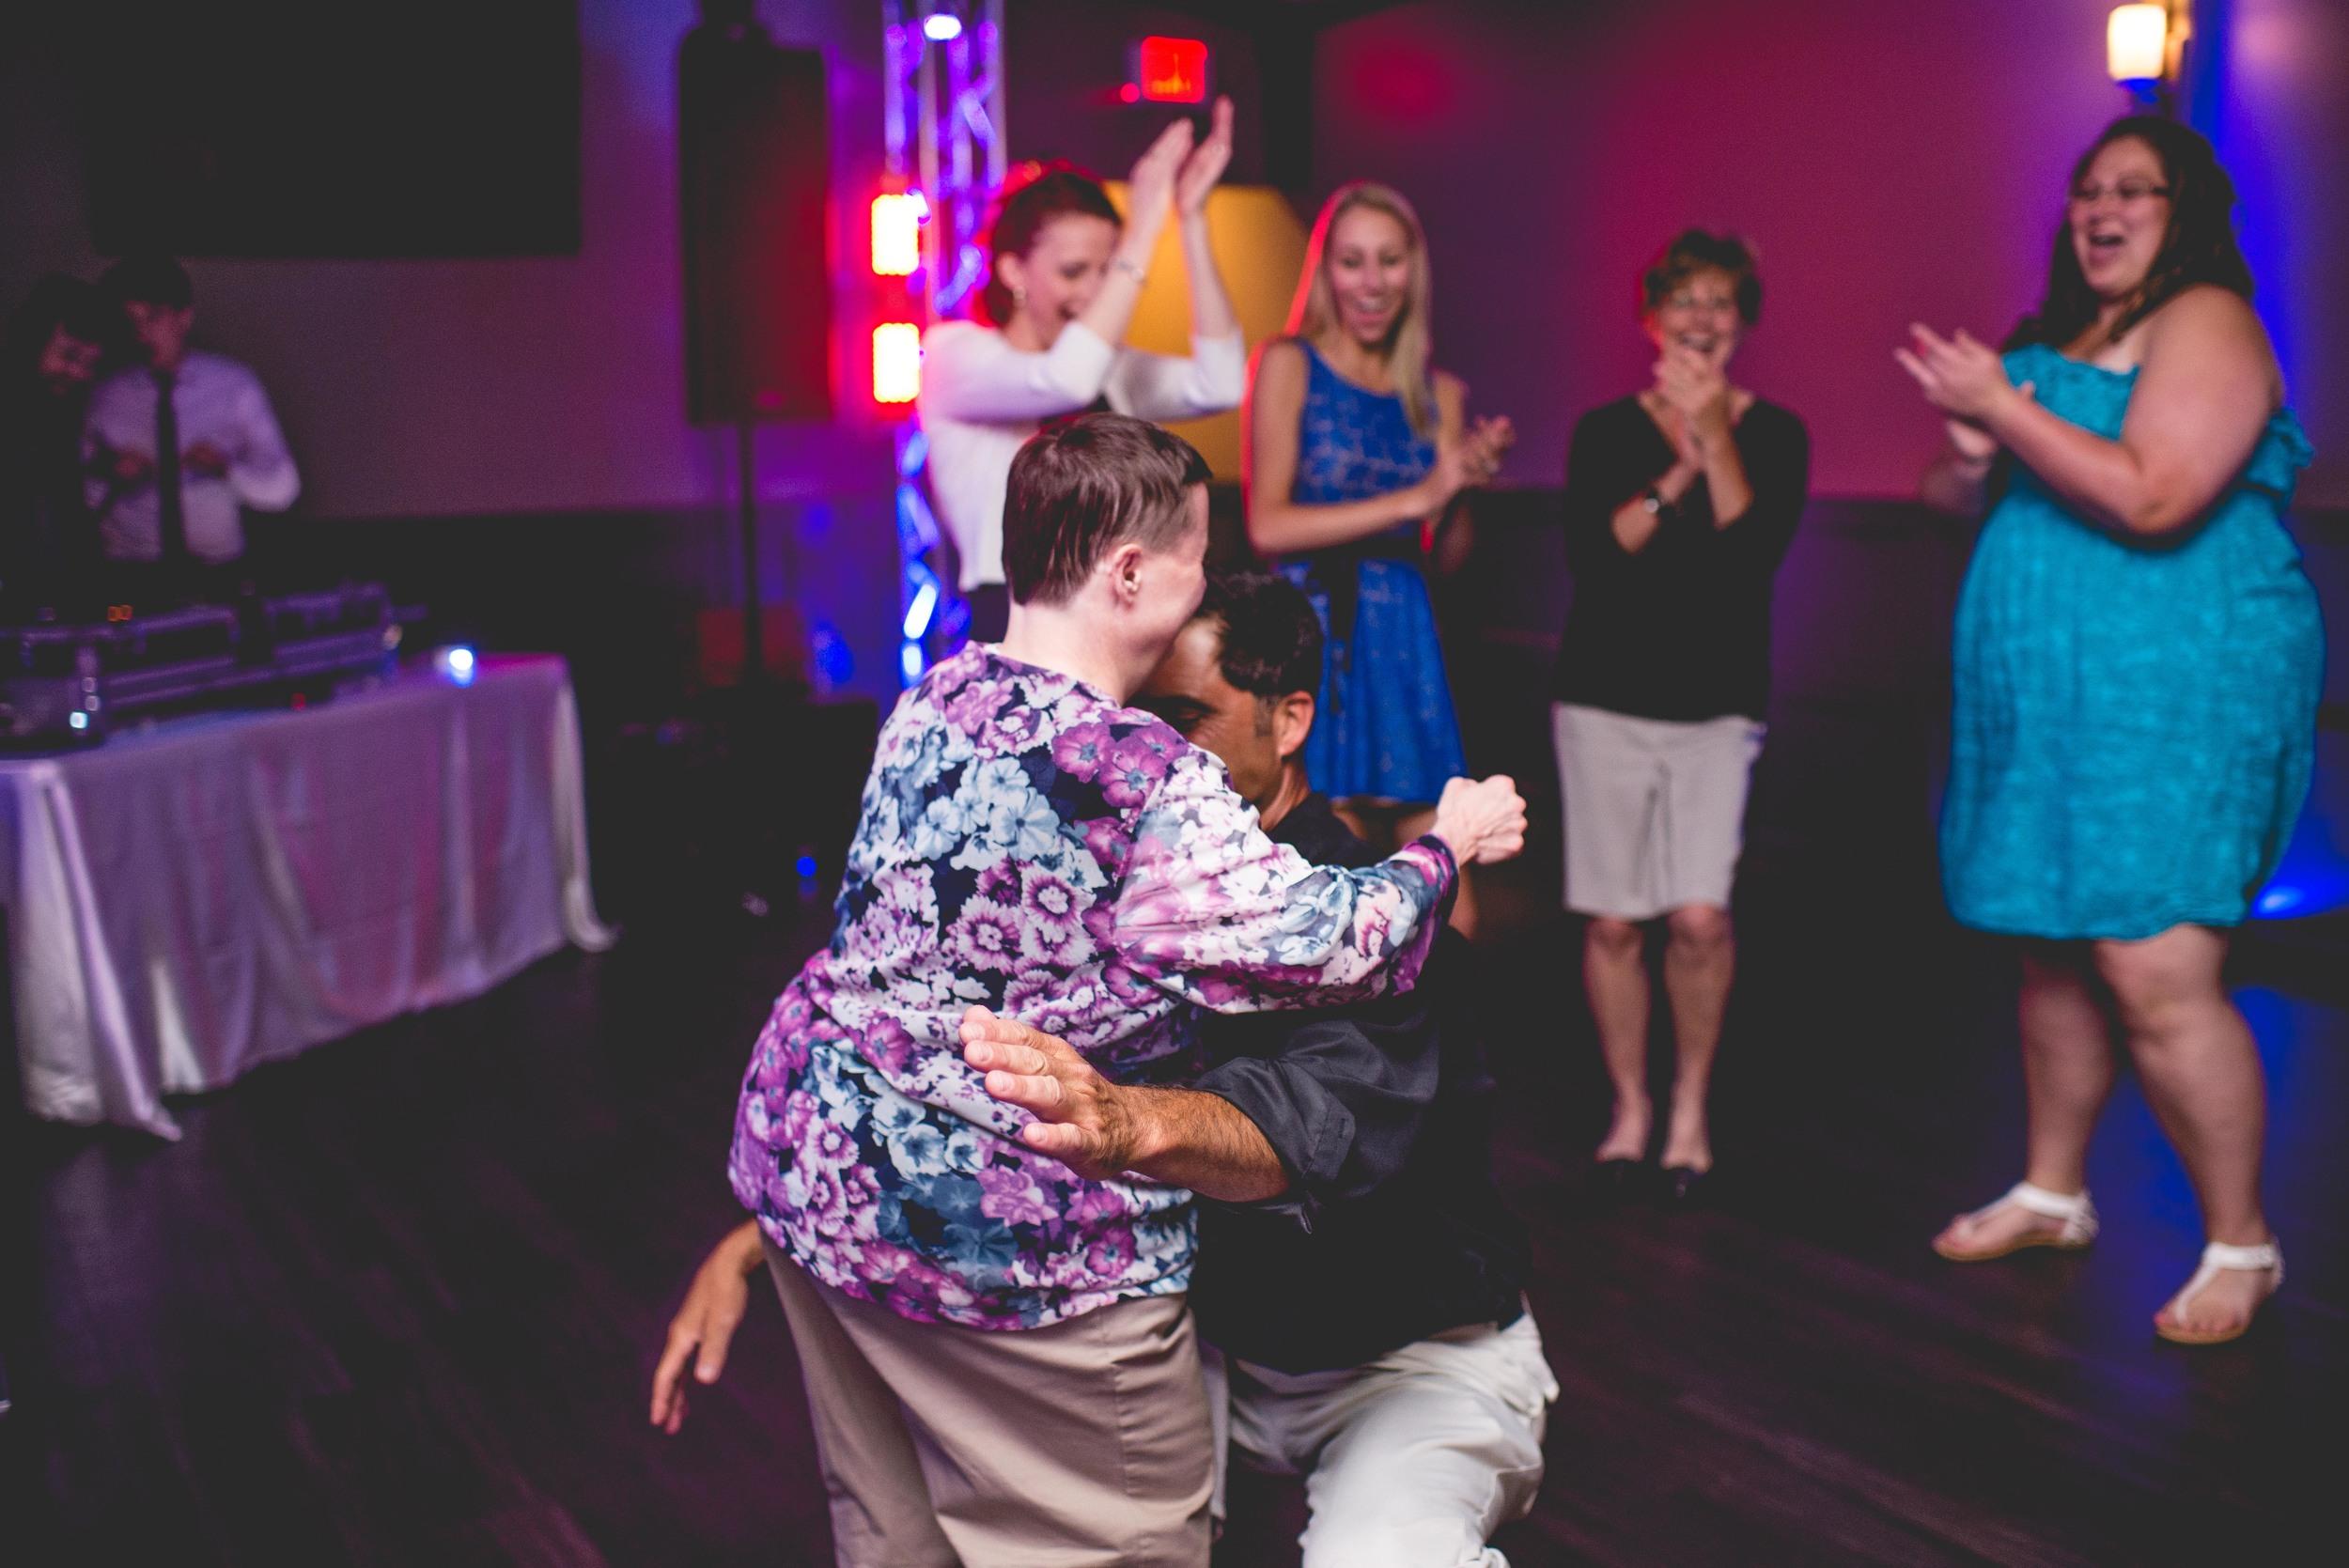 sarasutterphotography_leeandshalon_wedding_2015-774.jpg